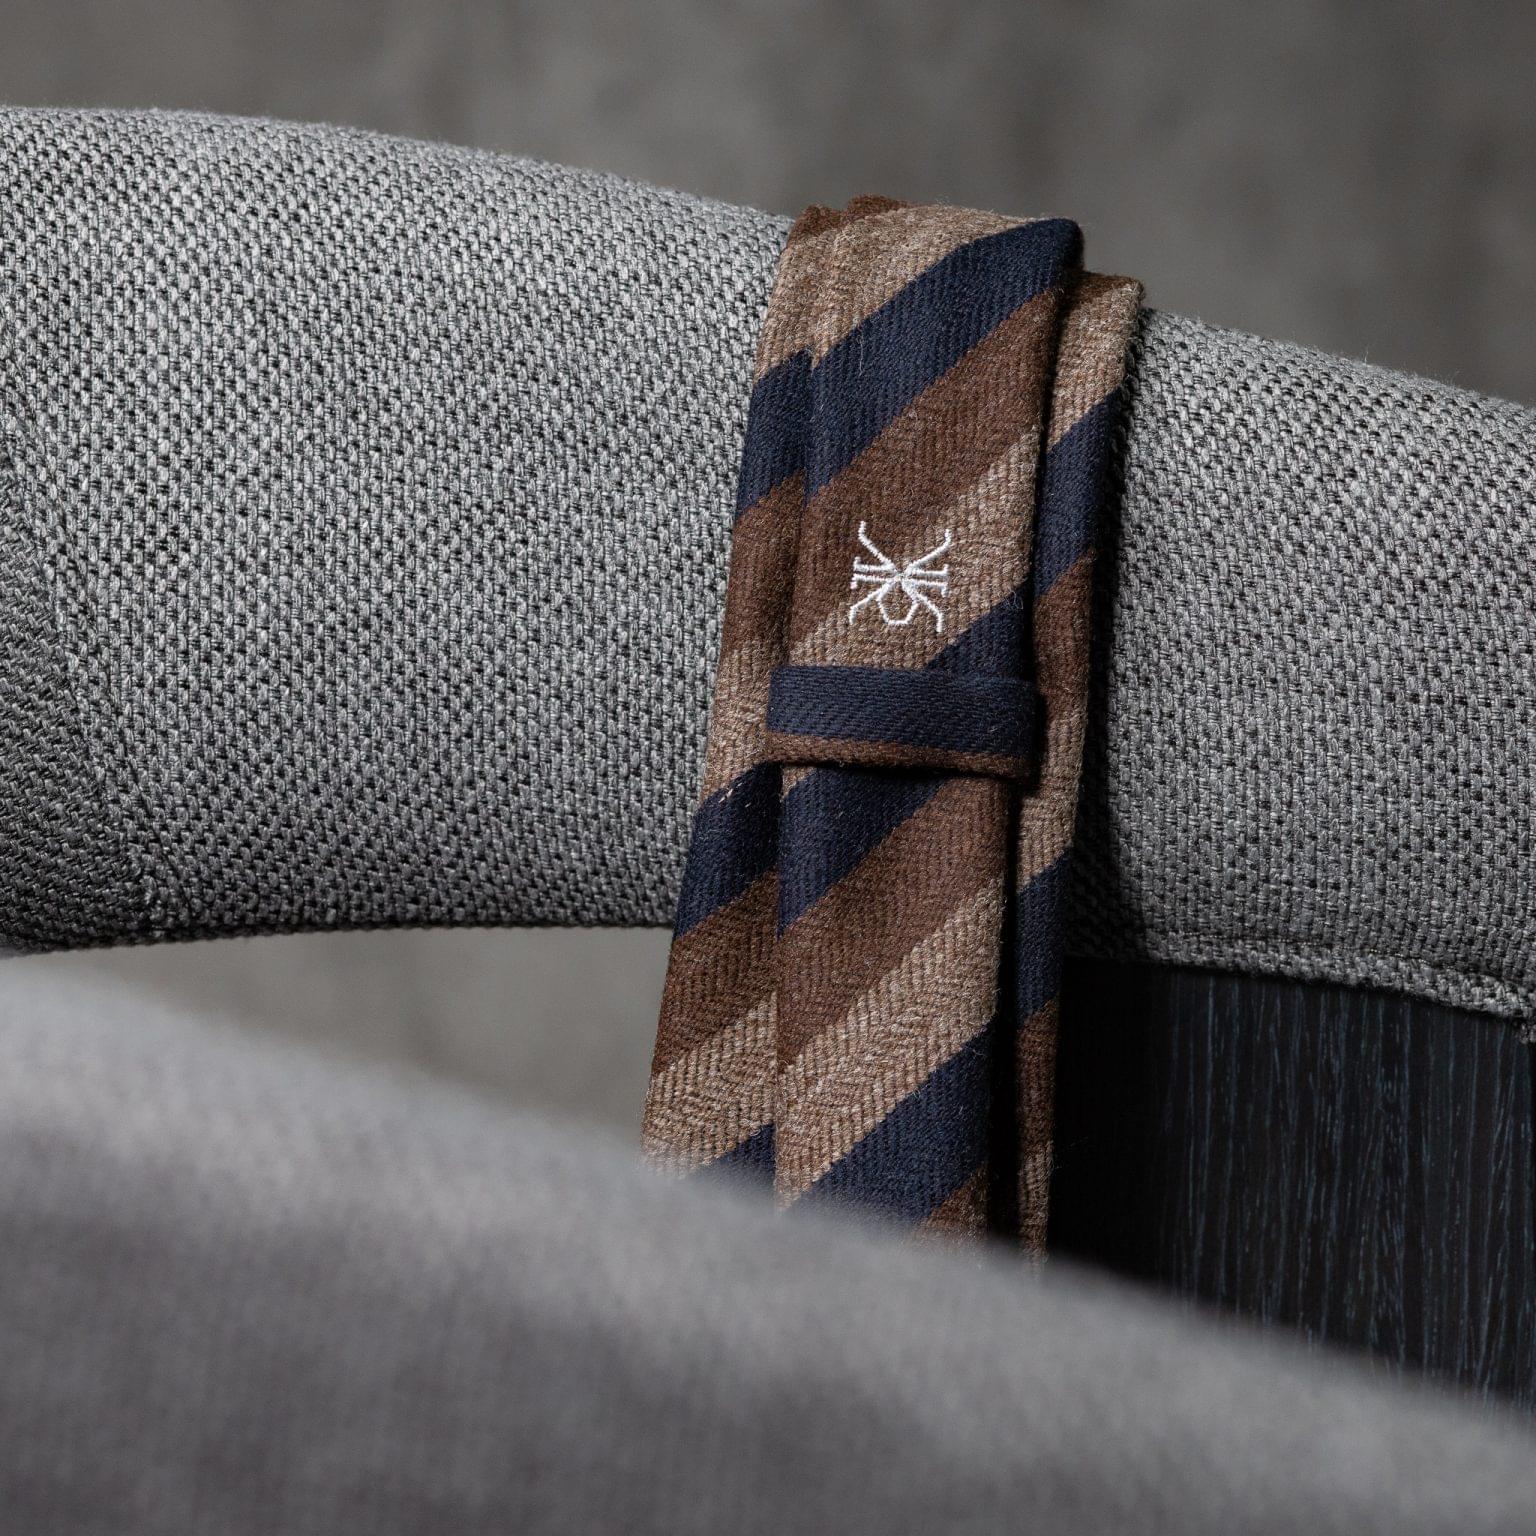 WOOL-LANA-0515-Tie-Initials-Corbata-Iniciales-The-Seelk-4